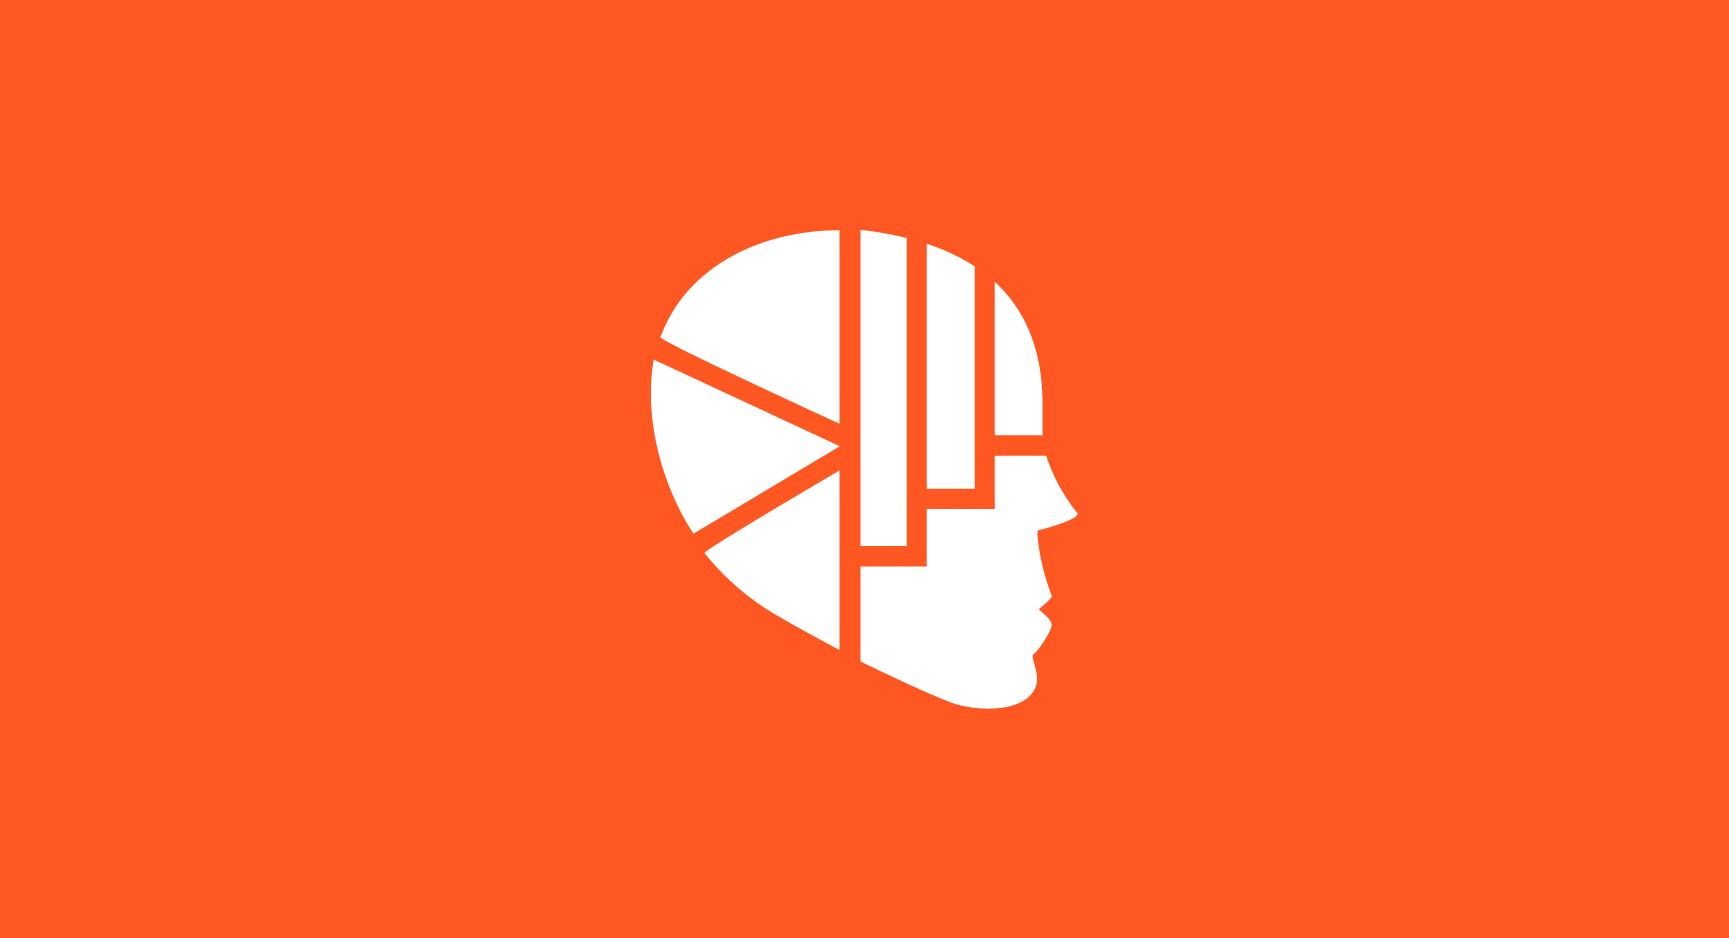 59c2c76c0fce350001b53a78_amplifai simple logo